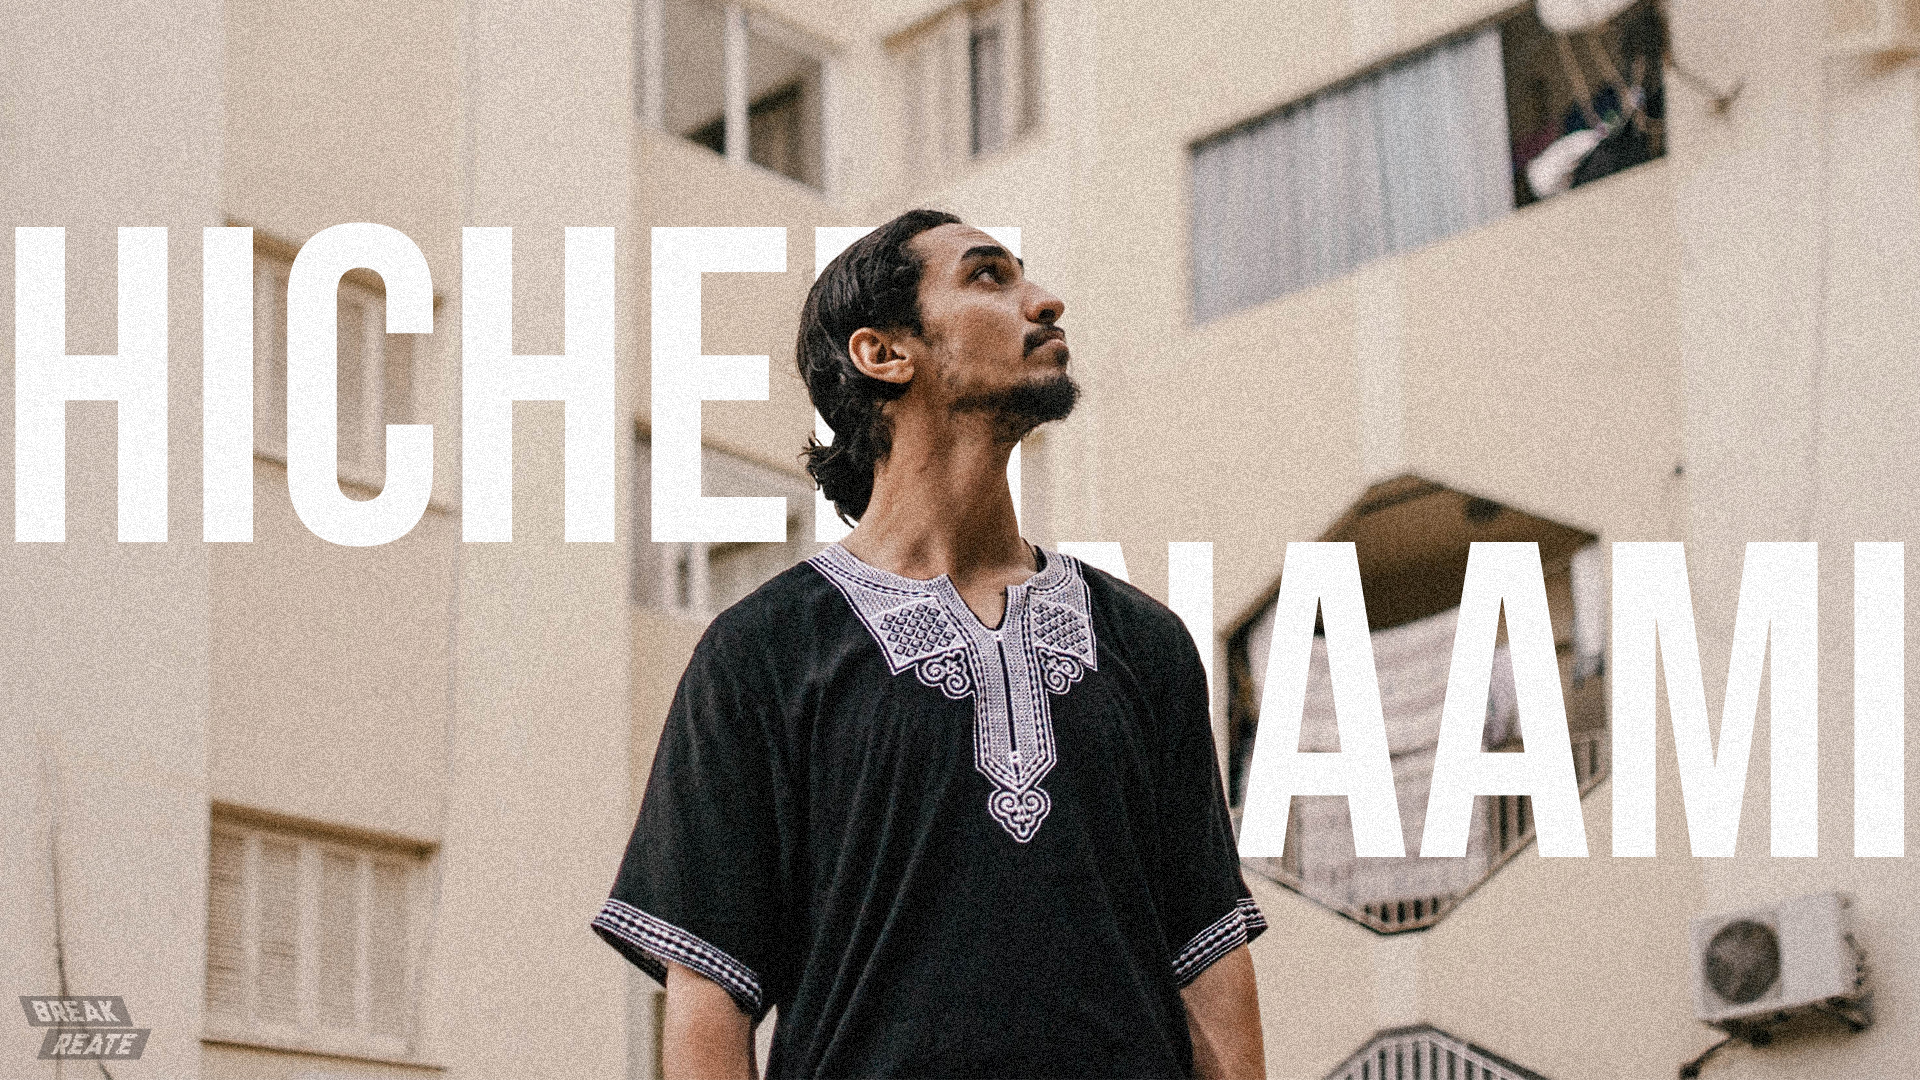 Hichem Naami: Building The Parkour Community In Tunisia